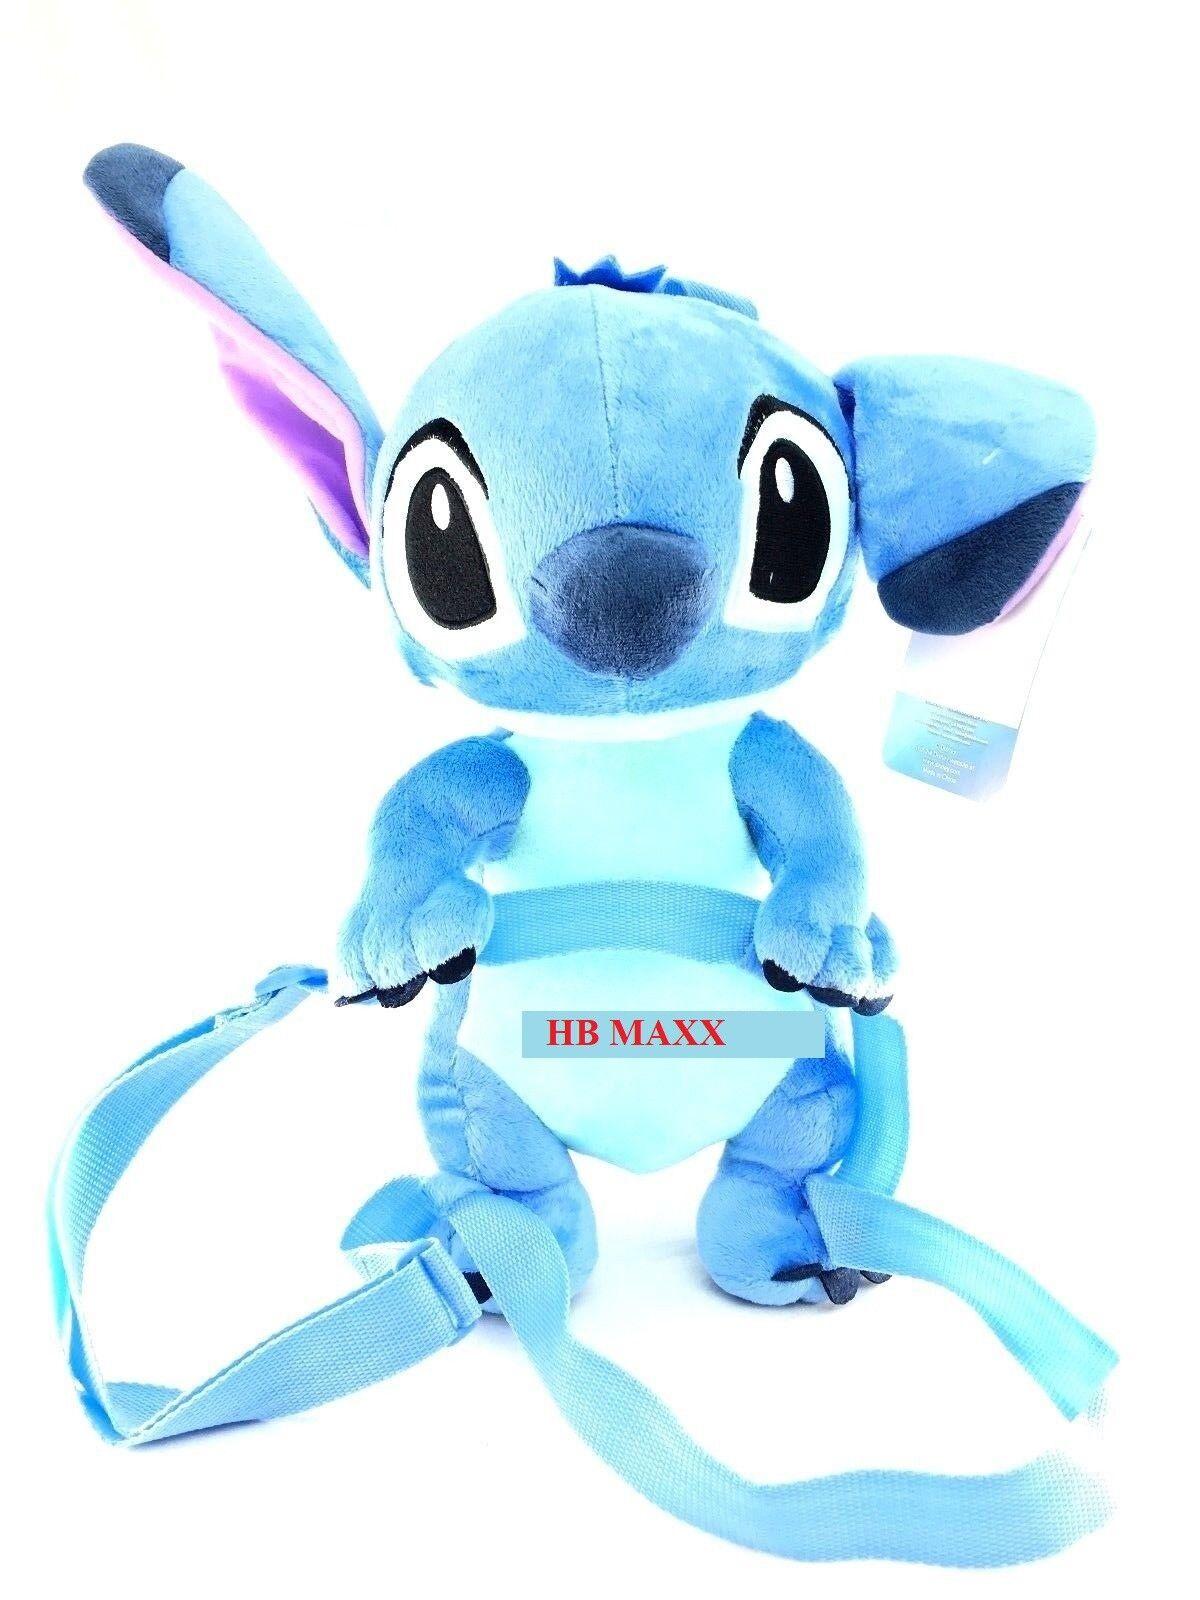 "Disney Lilo and Stitch - Stitch Blue 16"" Soft  2 in 1 Plush"